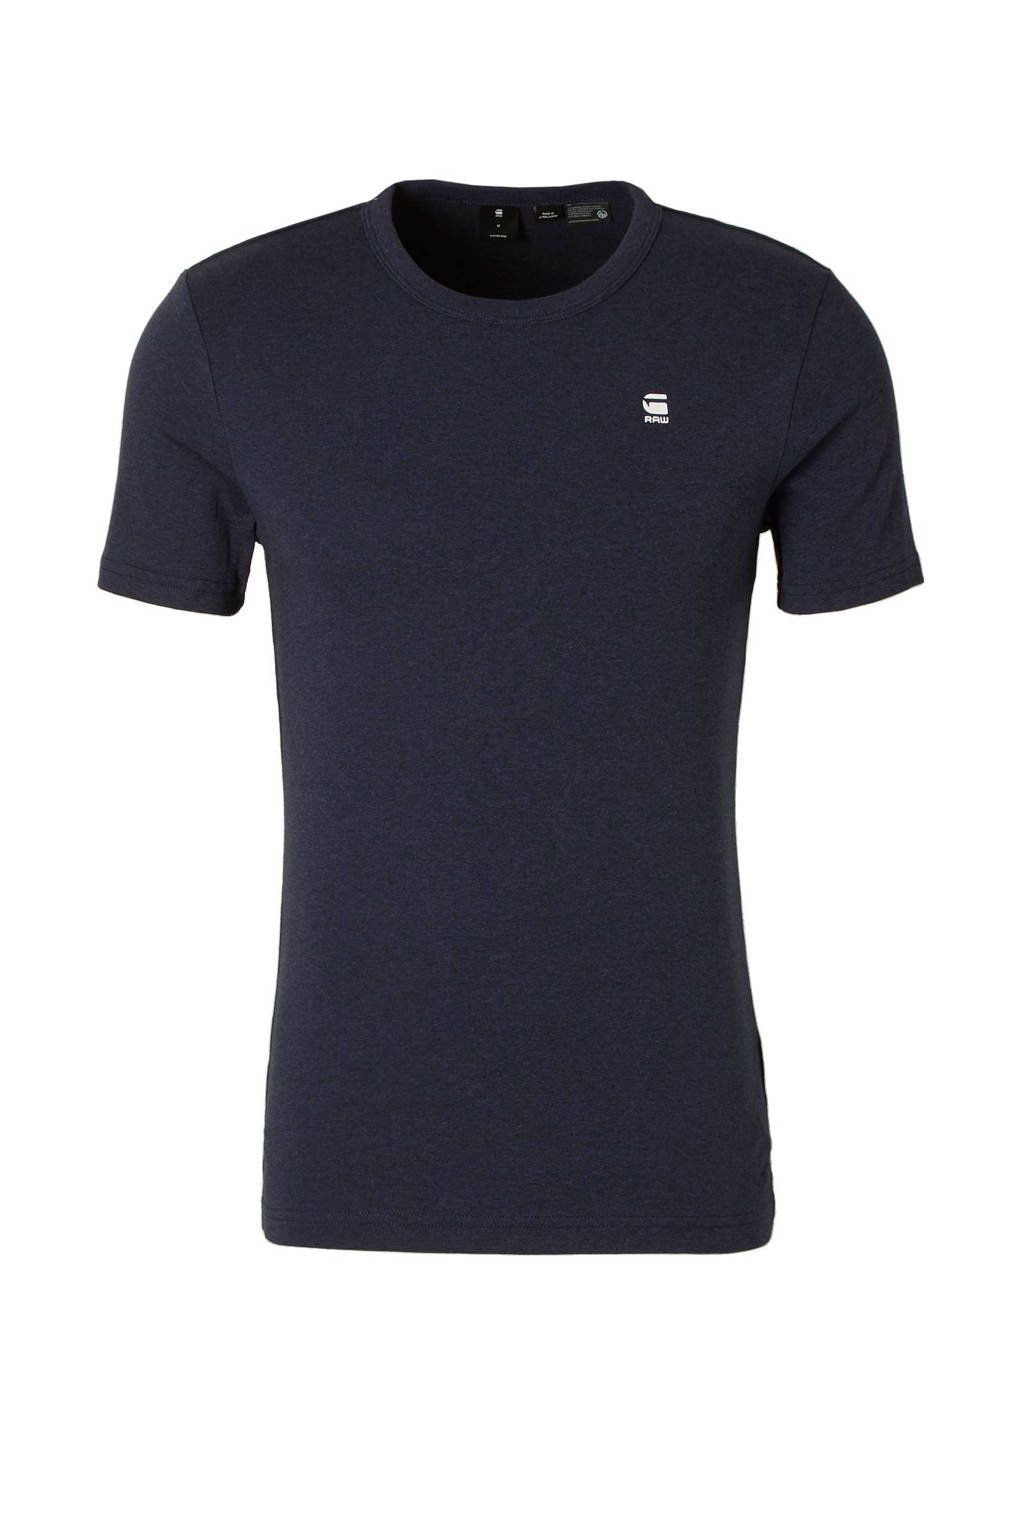 G-Star RAW Daplin T-shirt, Donkerblauw